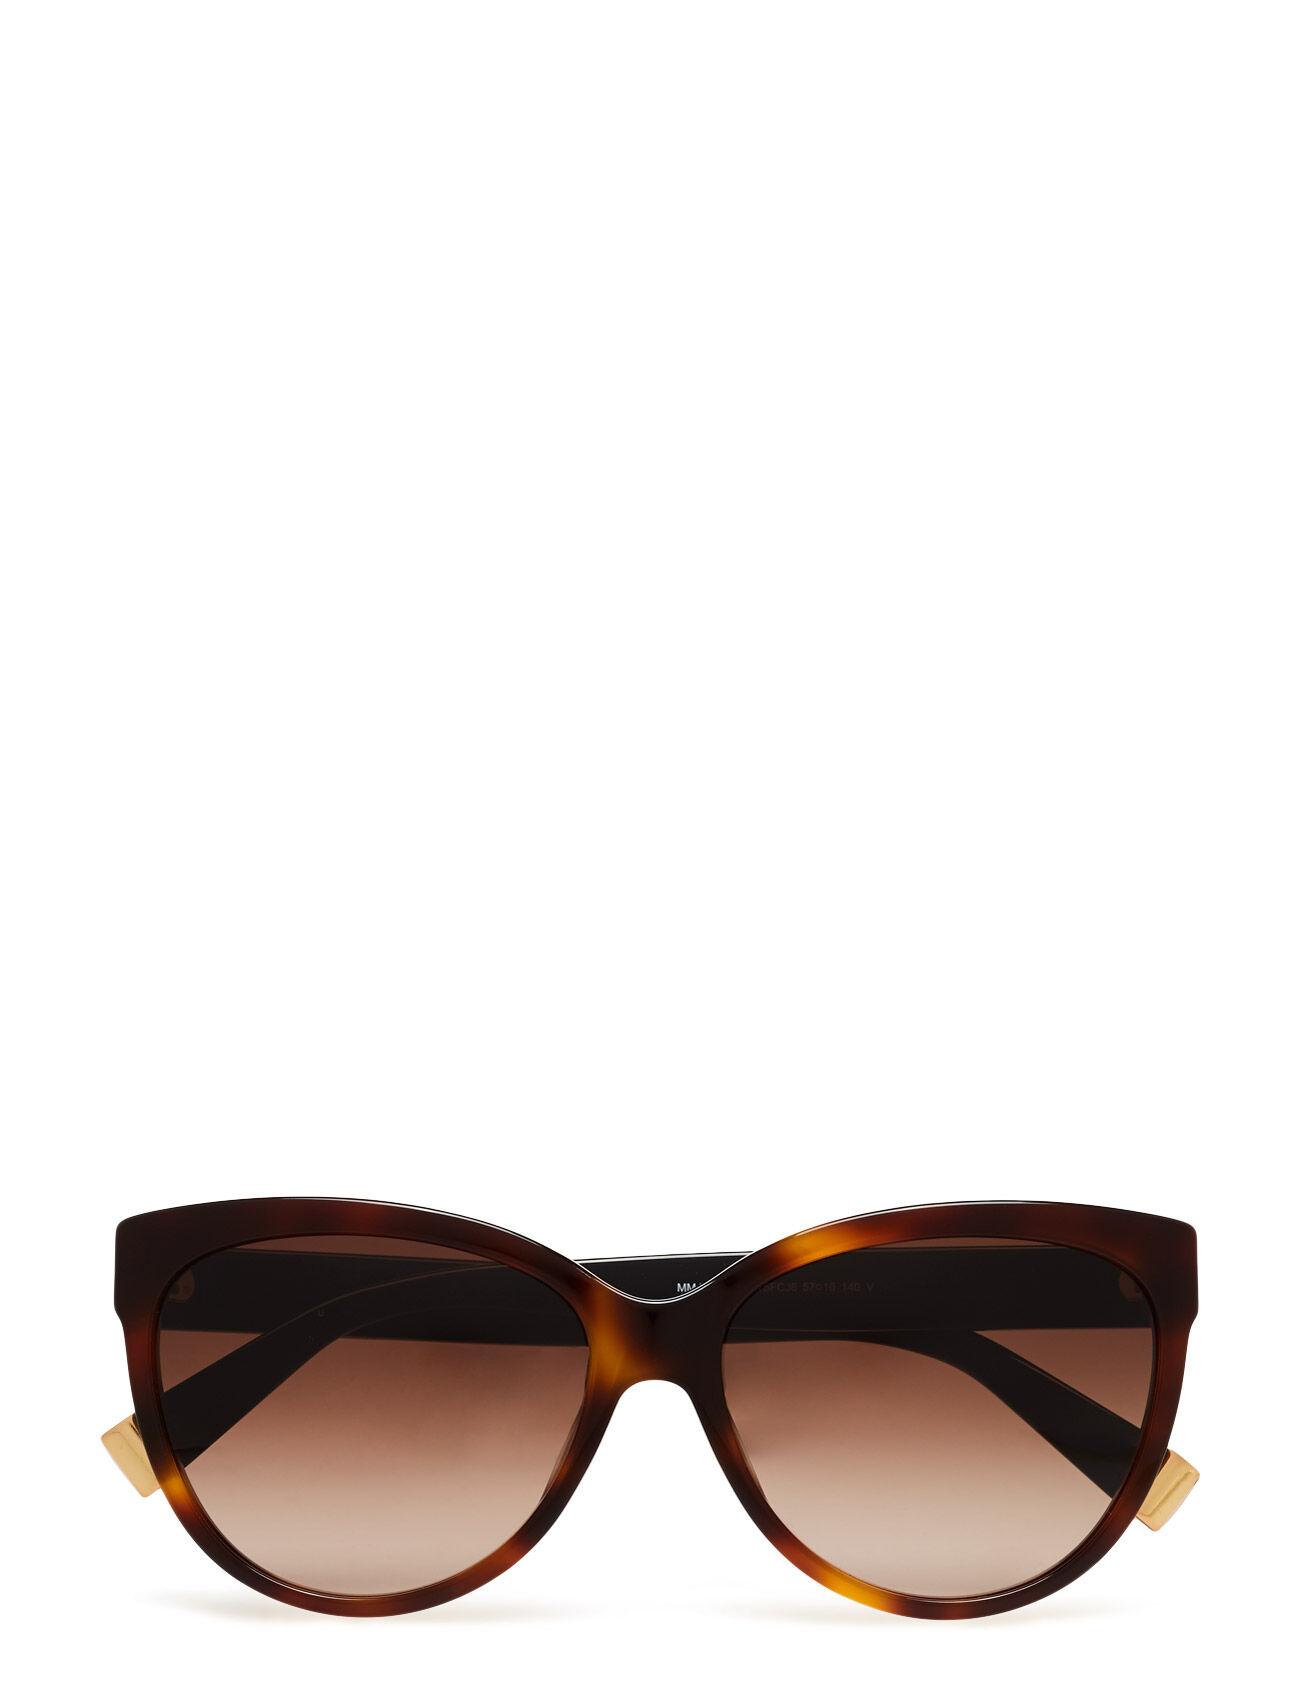 MAXMARA Sunglasses Mm Modern Iii